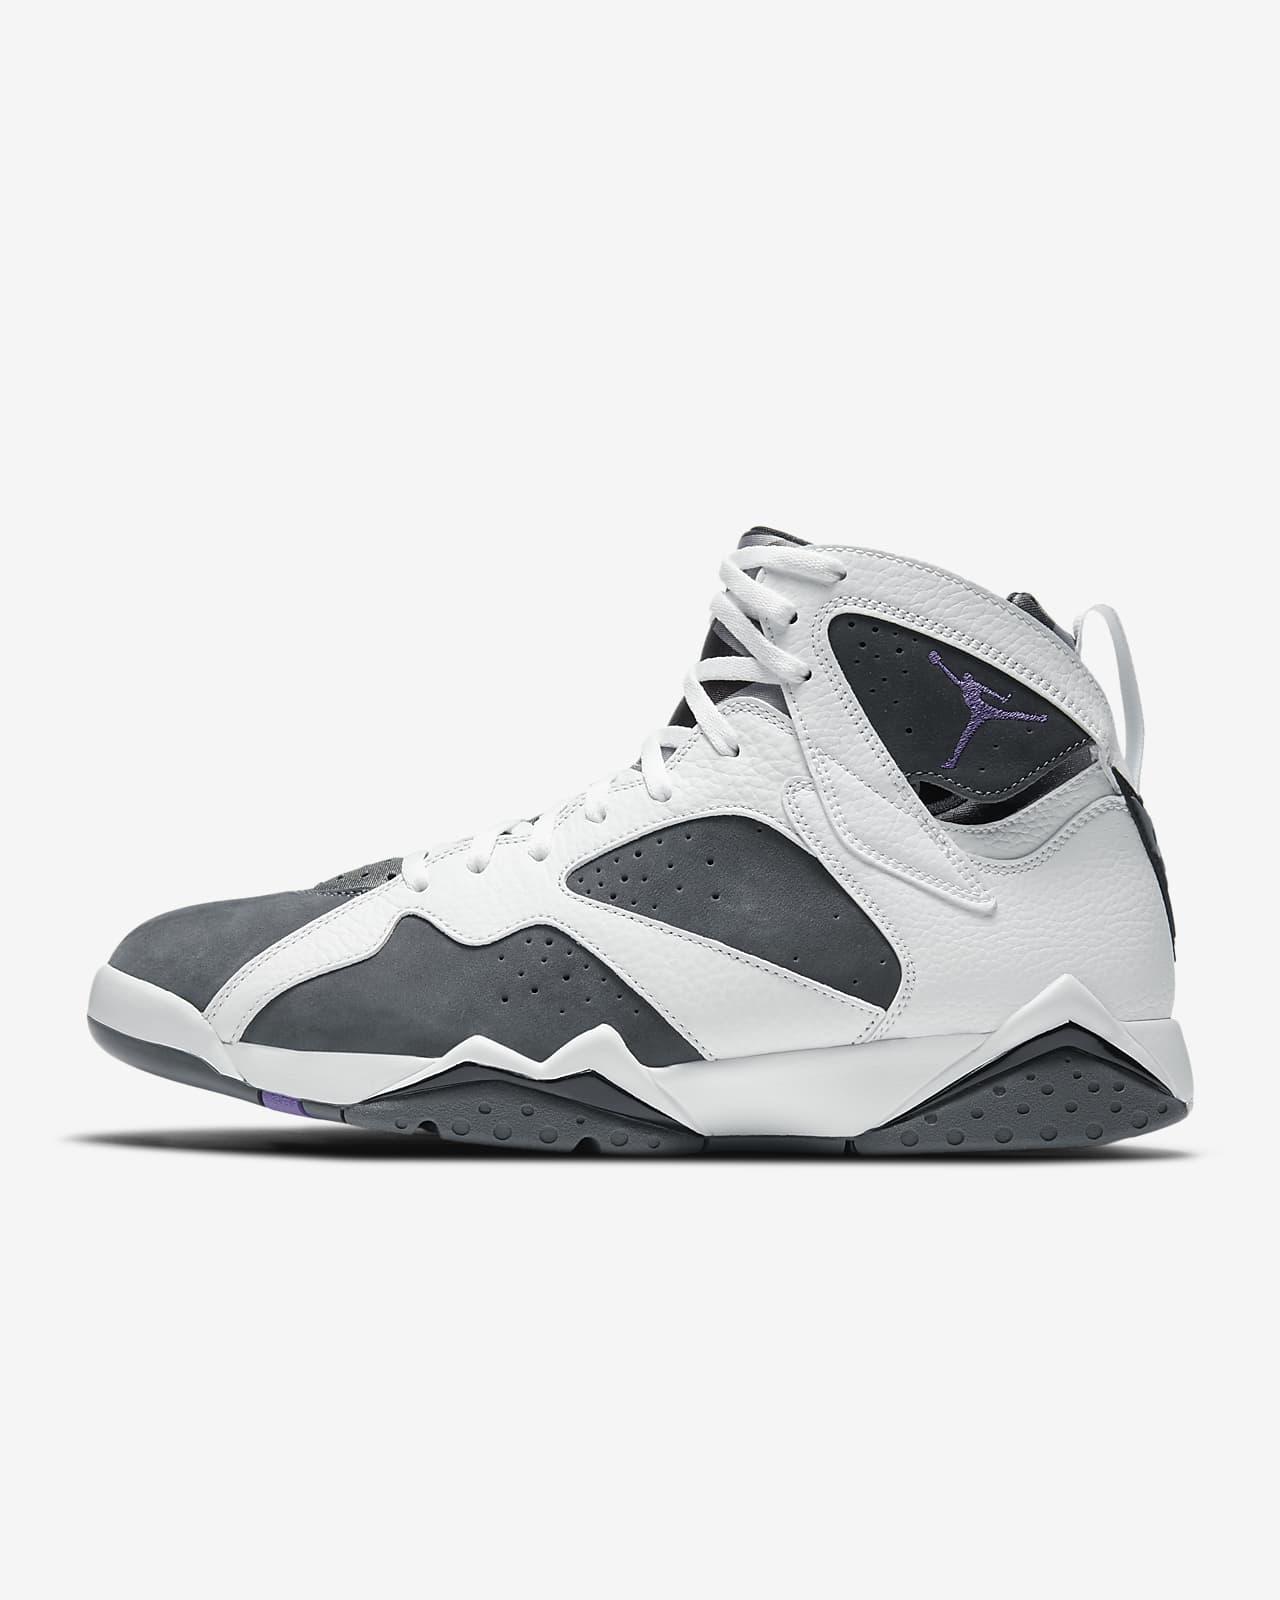 Air Jordan 7 Retro Men's Shoes